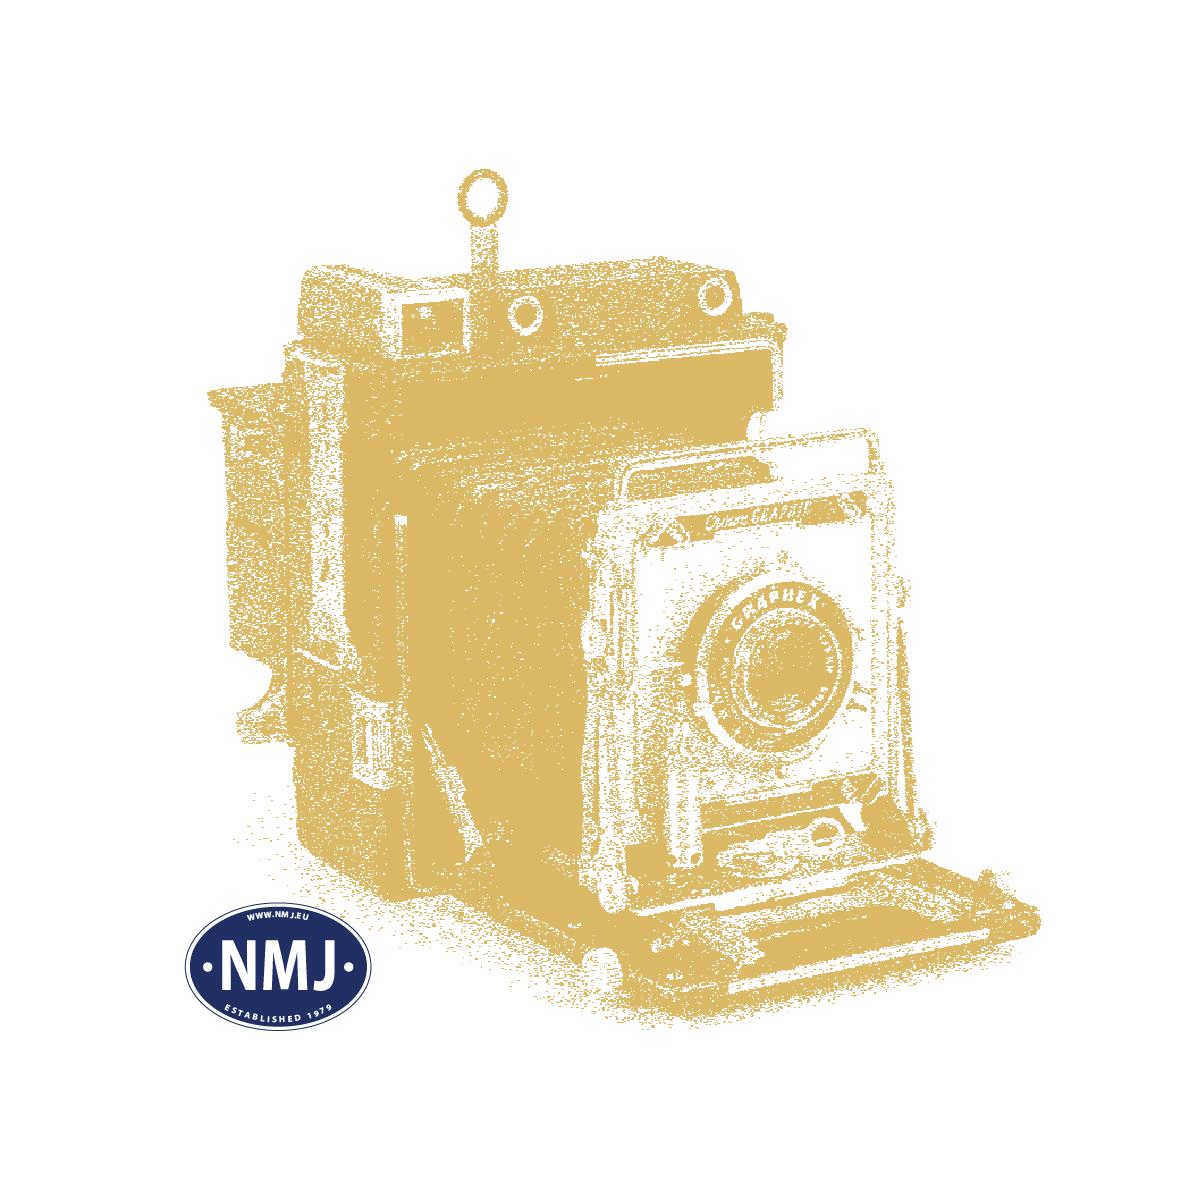 Superline Vogner, NMJ-Superline-NMJSLt47145-NSB-Flisvogn-Lt4-7145-Type1-handmade-brassmodel-HO, NMJSLt47145